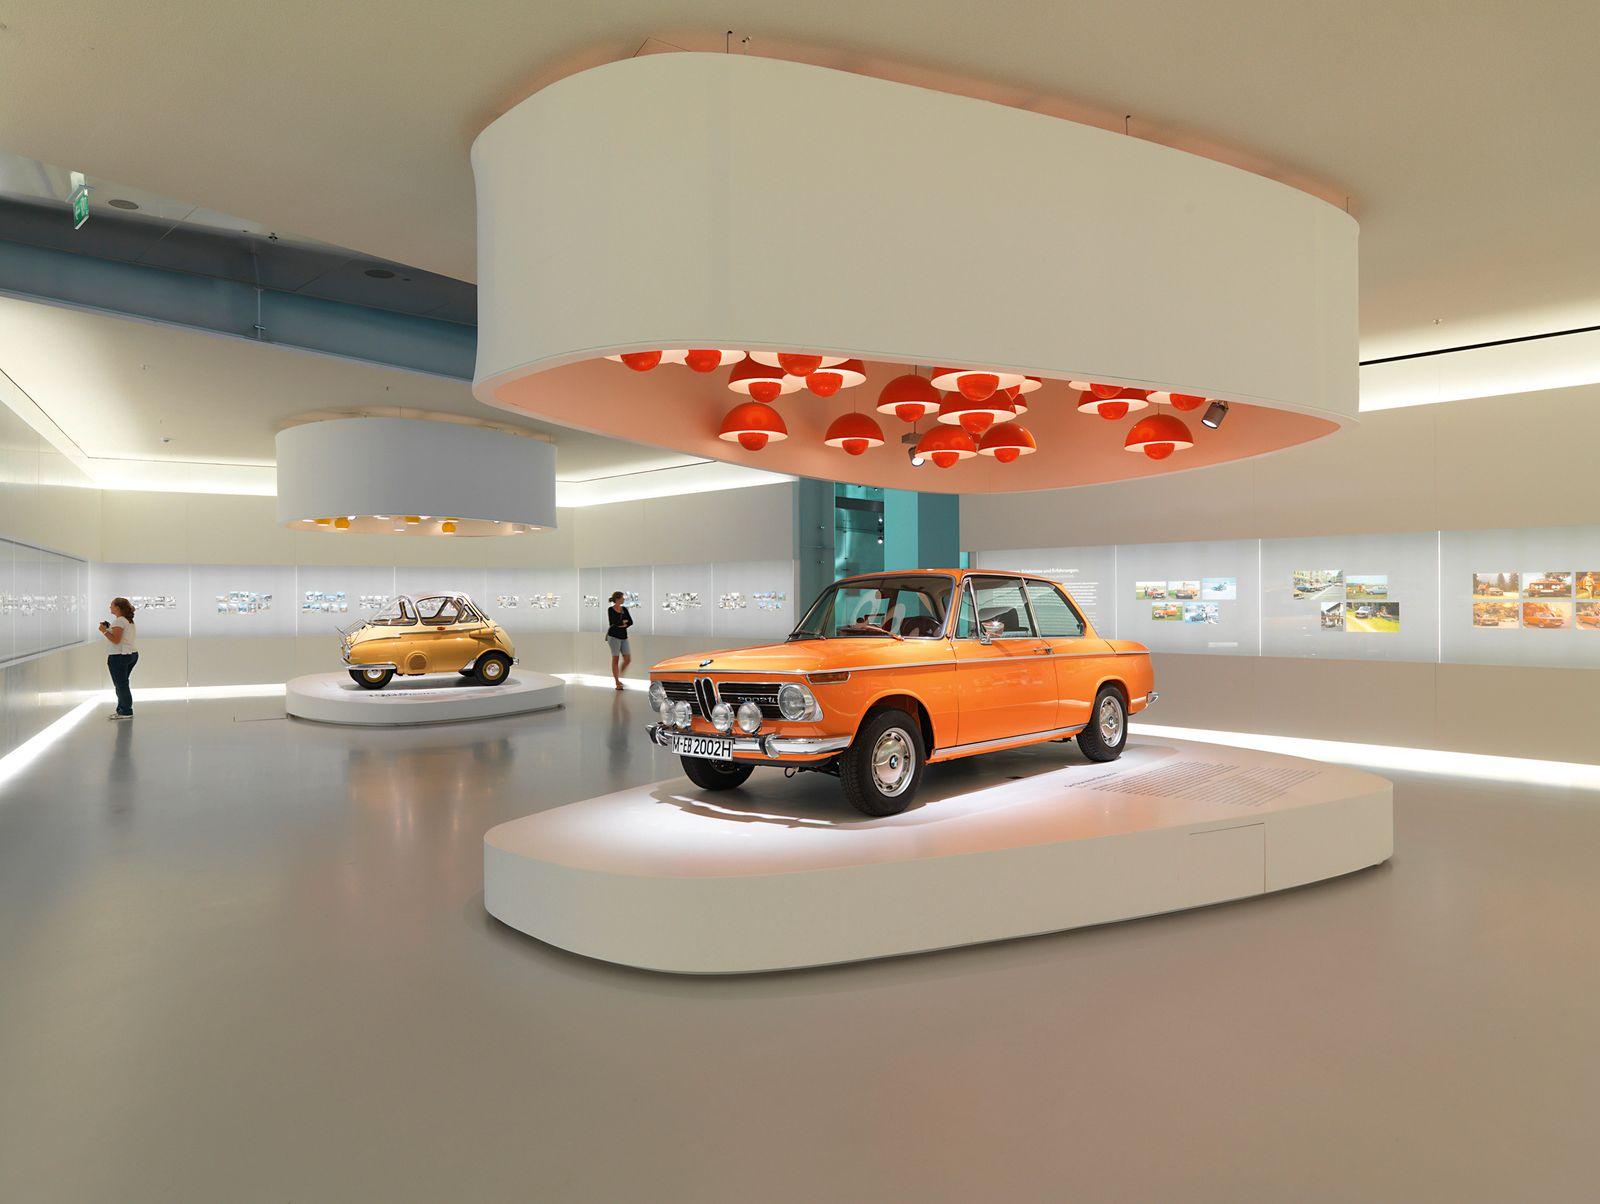 Stufenheck-Limousinen/ BMW 2002 TII/ 1966 (Kopie)